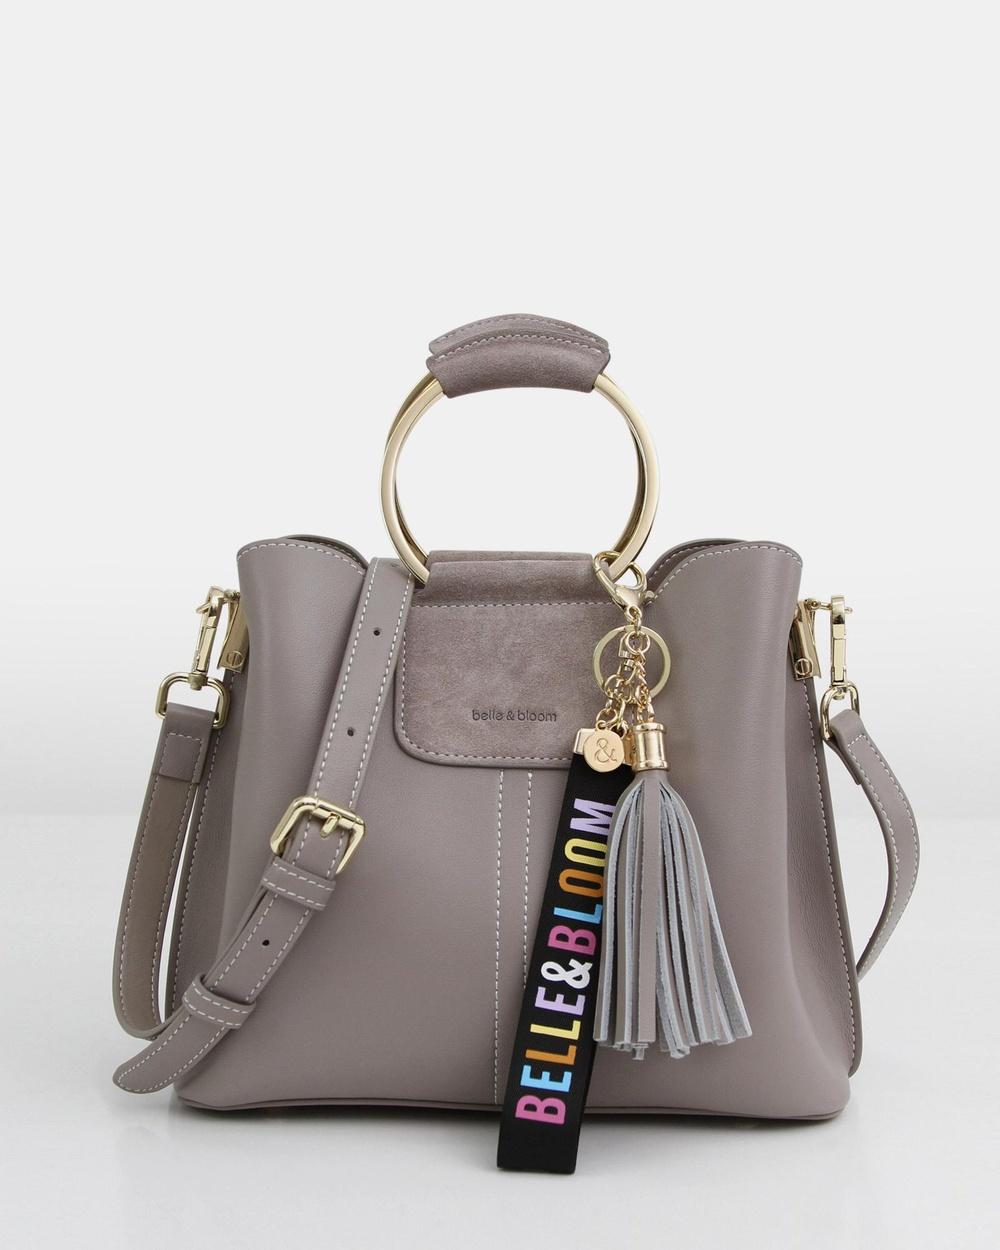 Belle & Bloom Twilight Leather Cross Body Bag Bags Grey Cross-Body